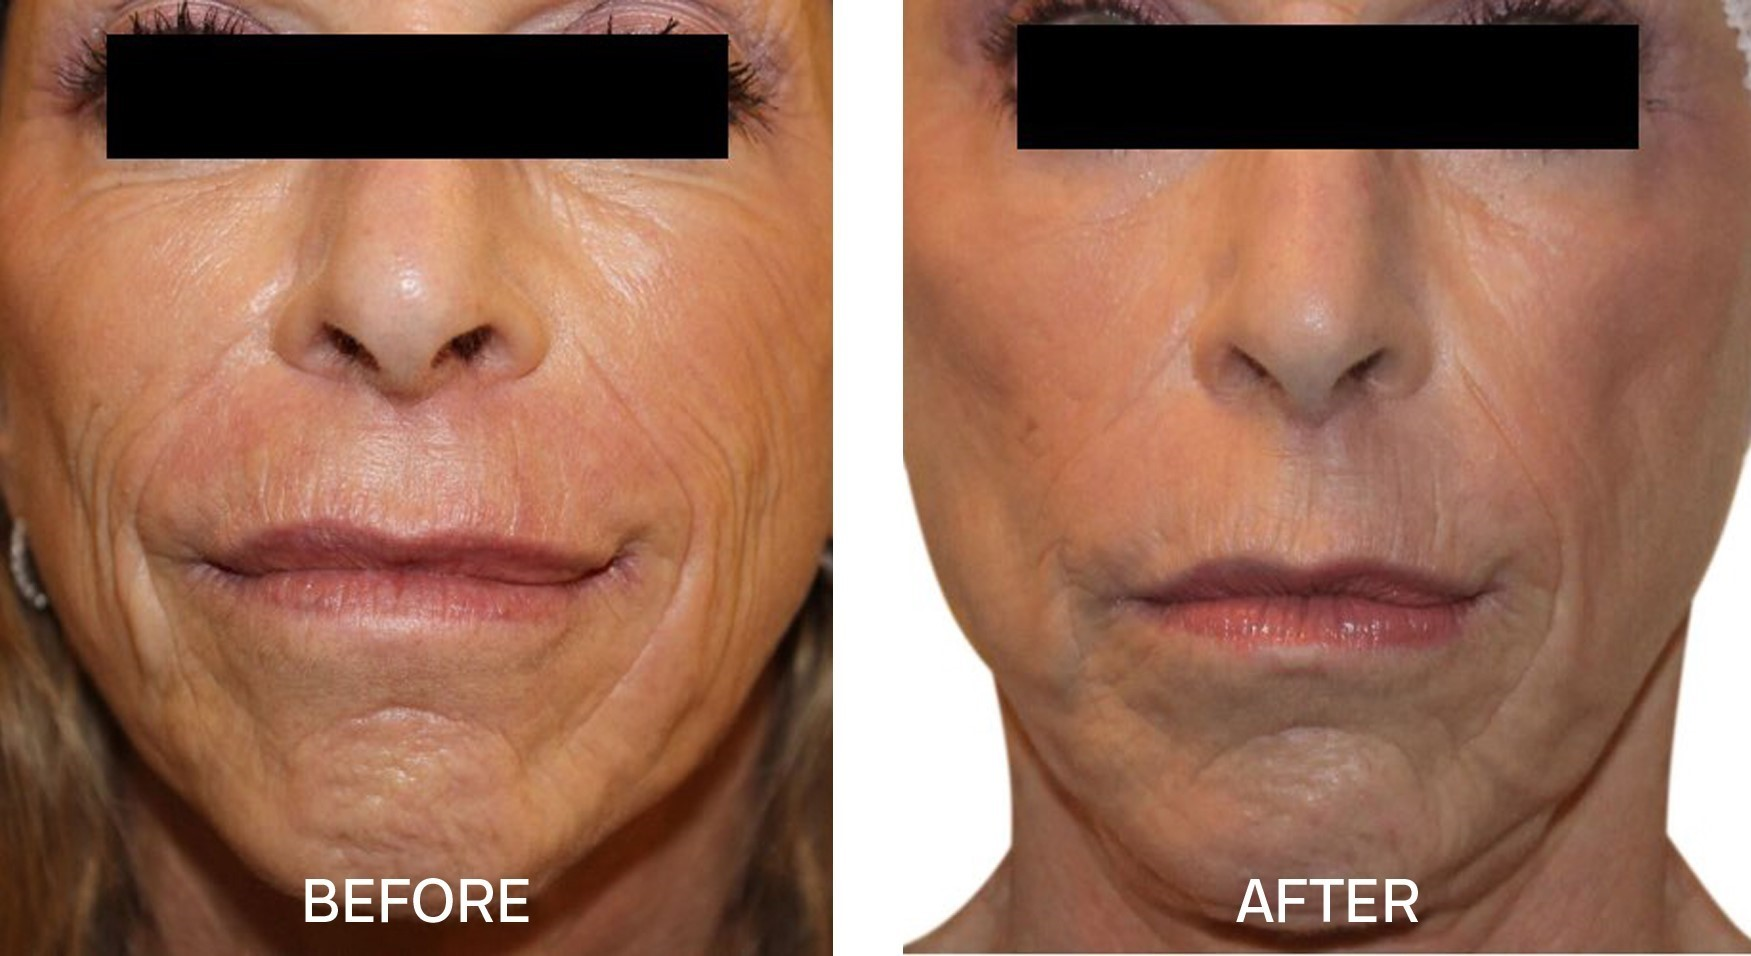 Venus Freeze™ for Wrinkle Reduction